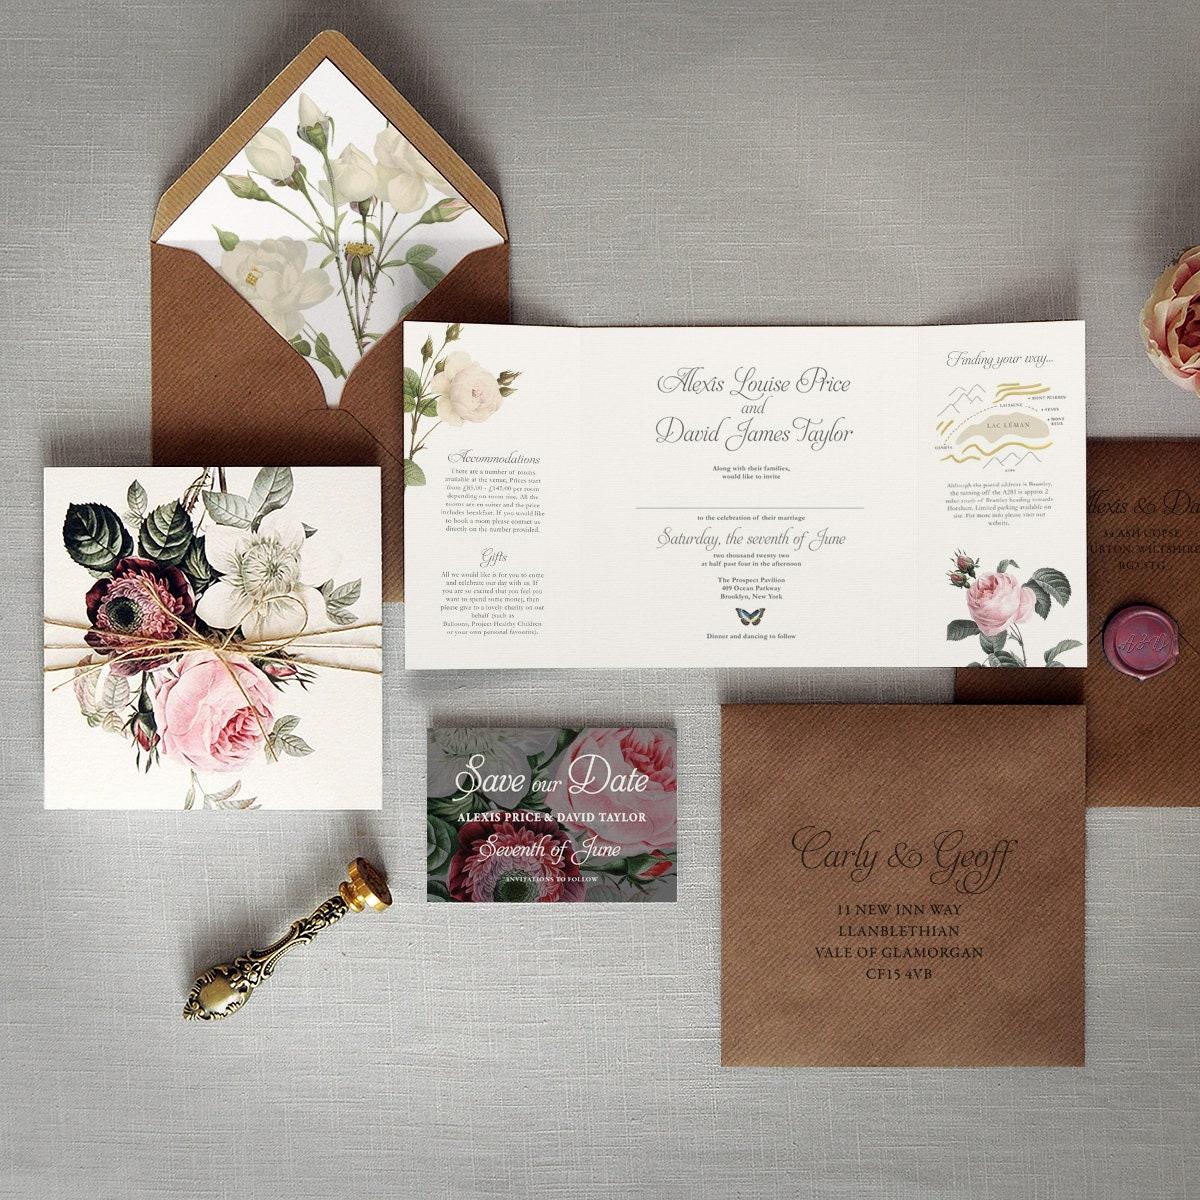 Luxury Wedding Invitations.English Garden Luxury Folding Wedding Invitations Save The Date Rustic Twine Greenery Wedding Invites Wax Seal Wedding Invitation Set